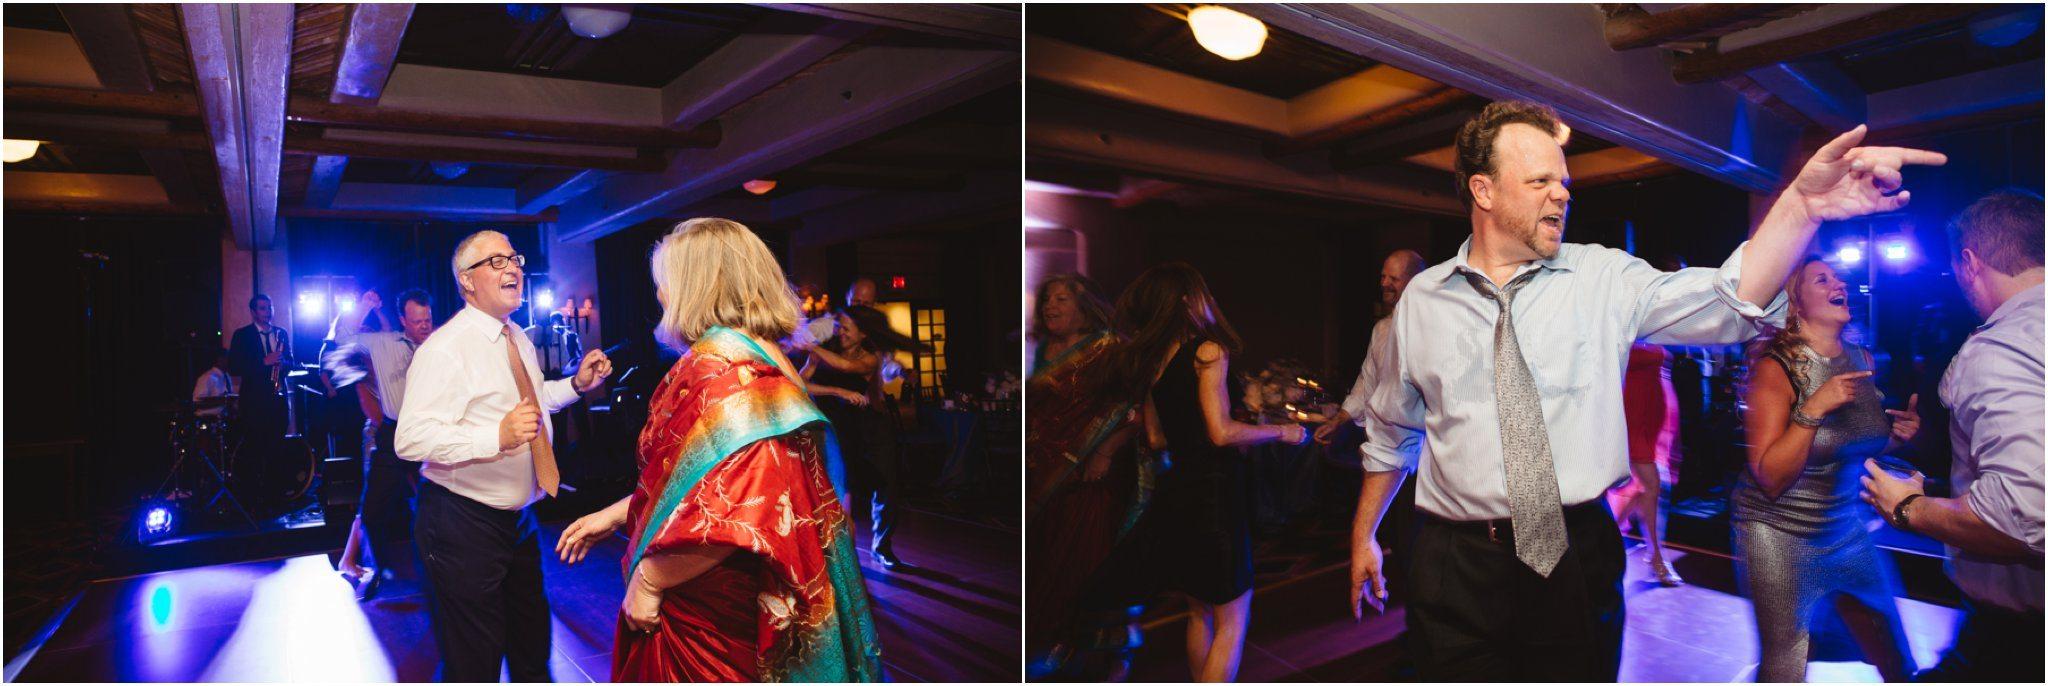 0046new-mexico-same-sex-wedding_santa-fe-wedding-photographer_albuquerque-wedding-photographer_top-photographer_-southwest-wedding-photography_-blue-rose-studio